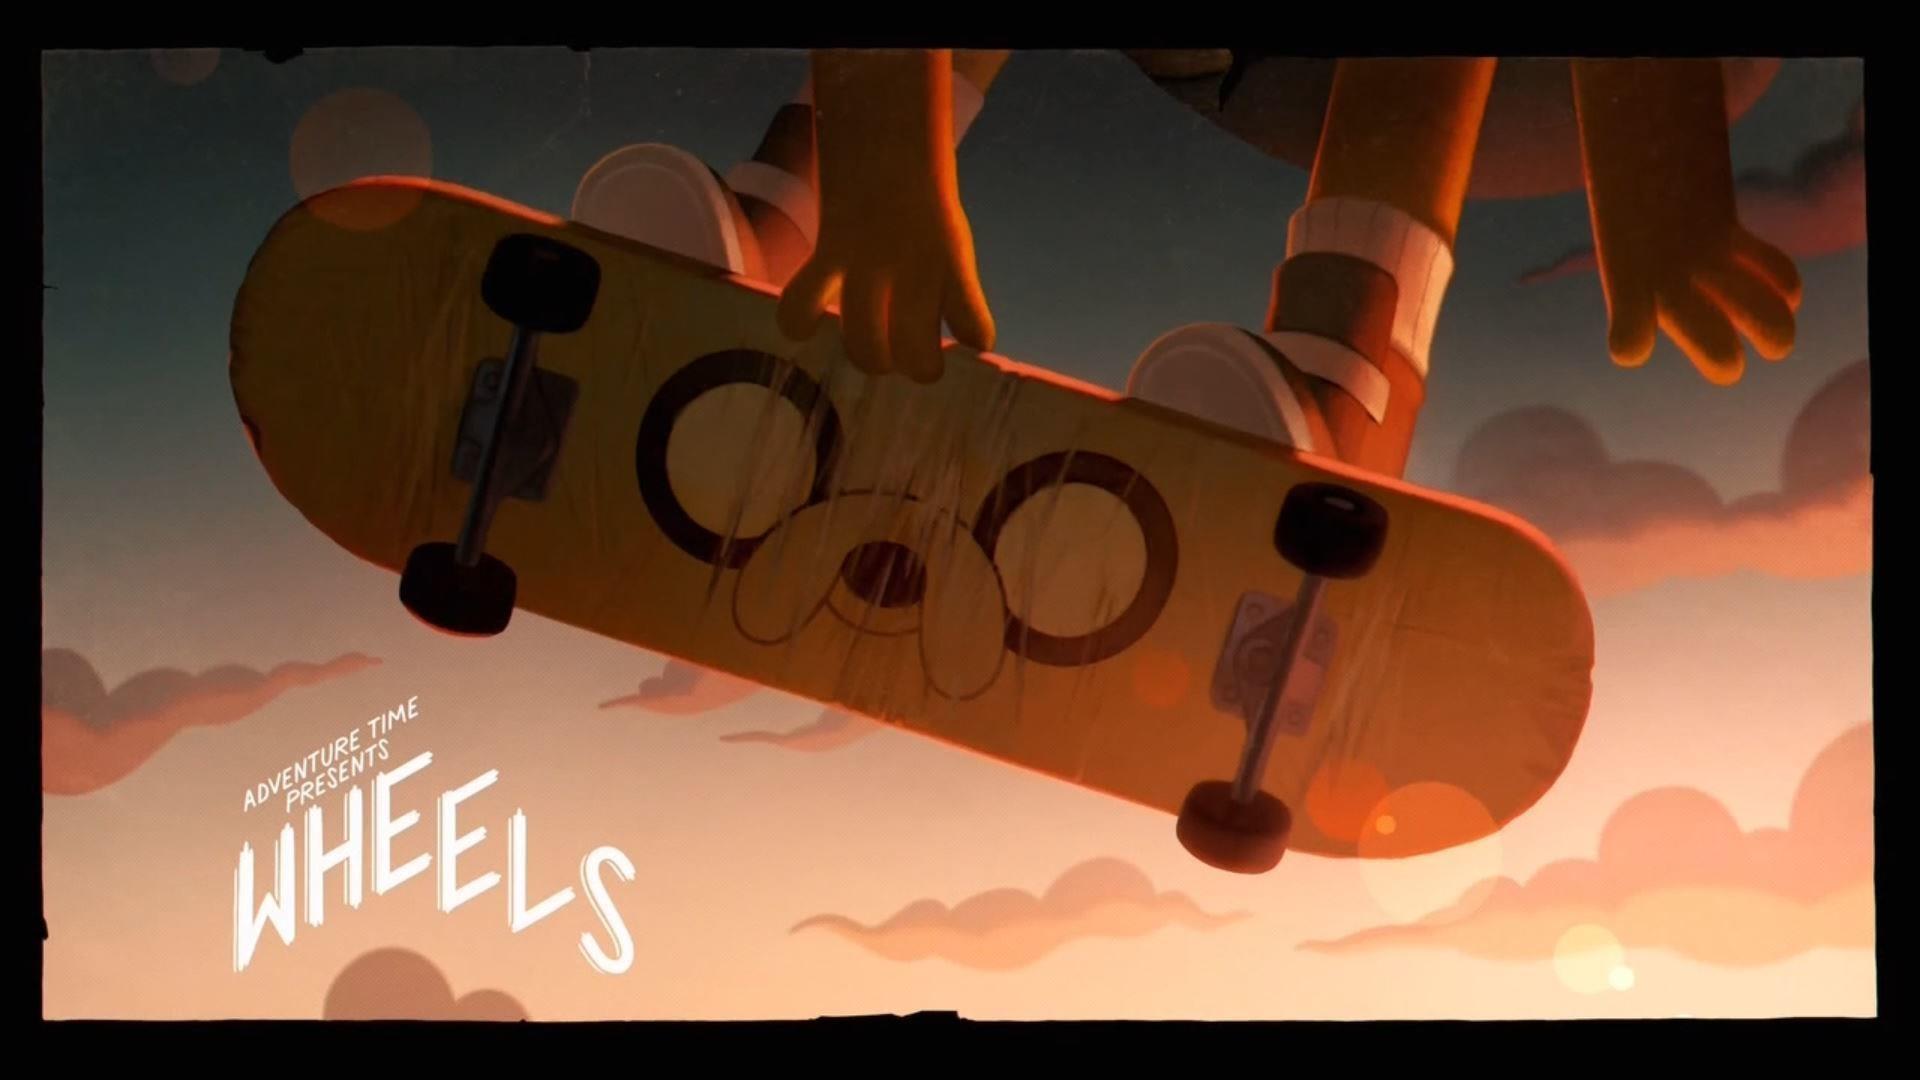 Adventure time full episodes season 5 episode 24 : Passport to paris dvd